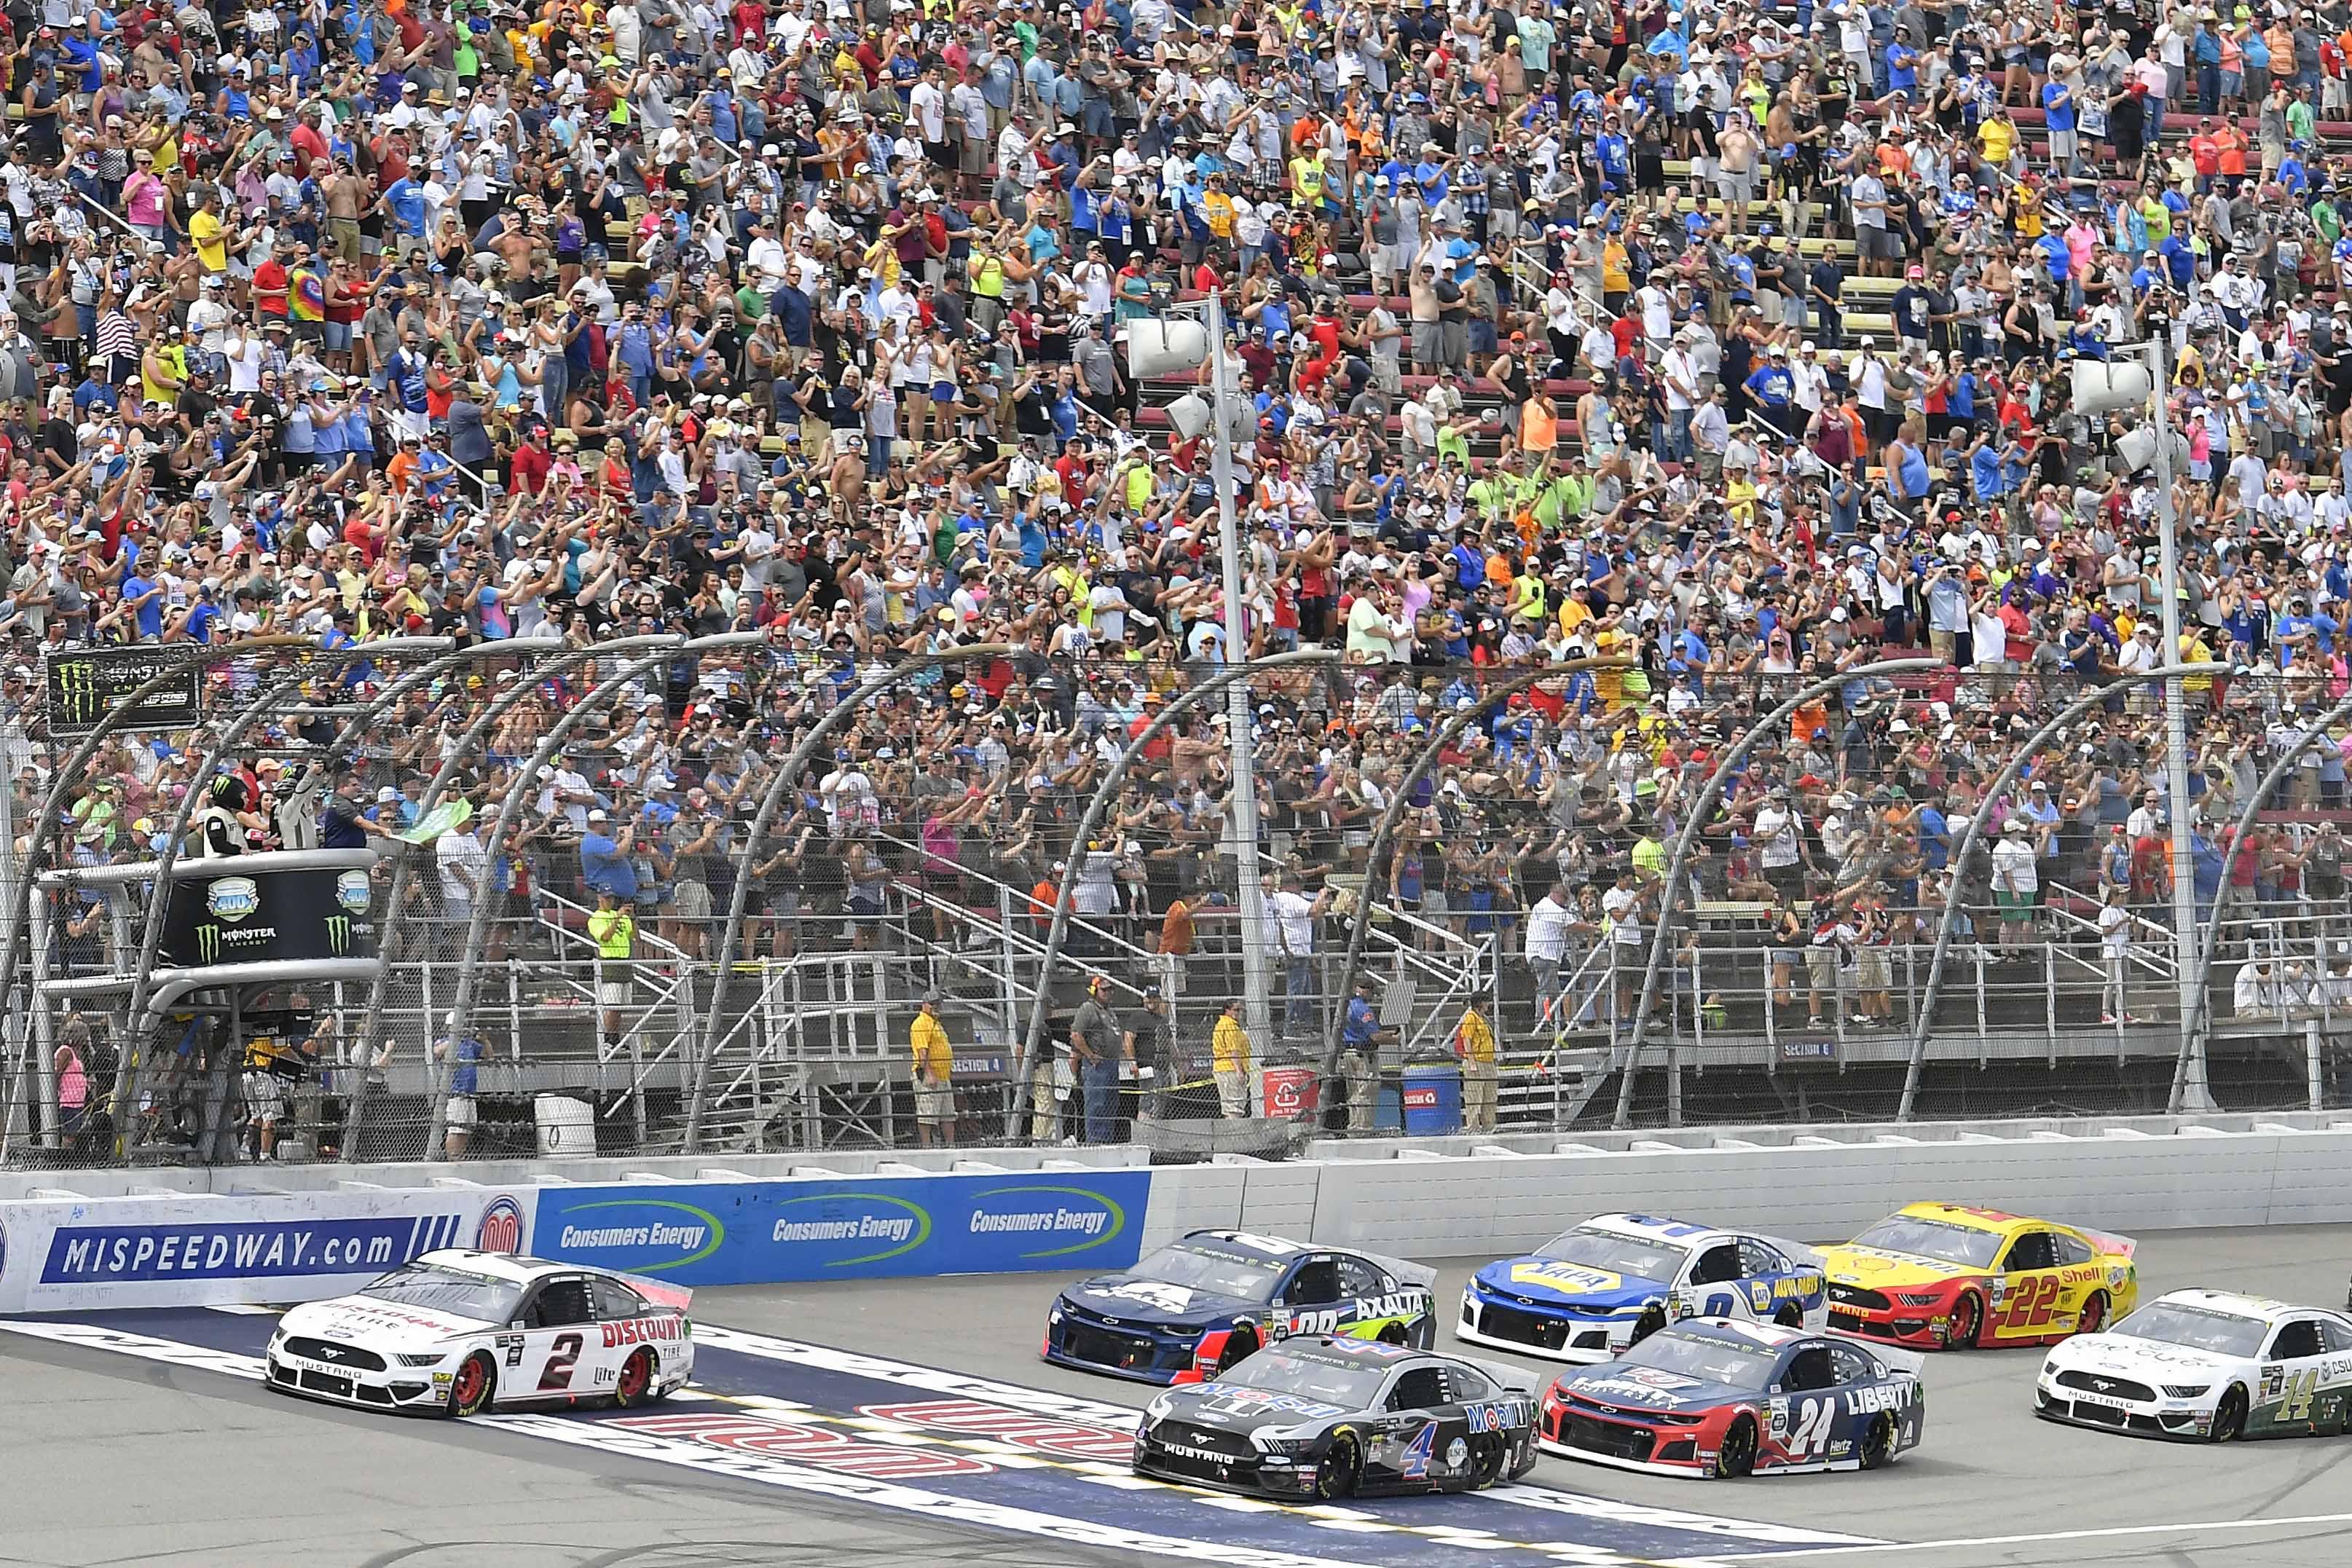 Brad Keselowski, Kevin Harvick, William Byron, Alex Bowman, Chase Elliott and Joey Logano at Michigan International Speedway